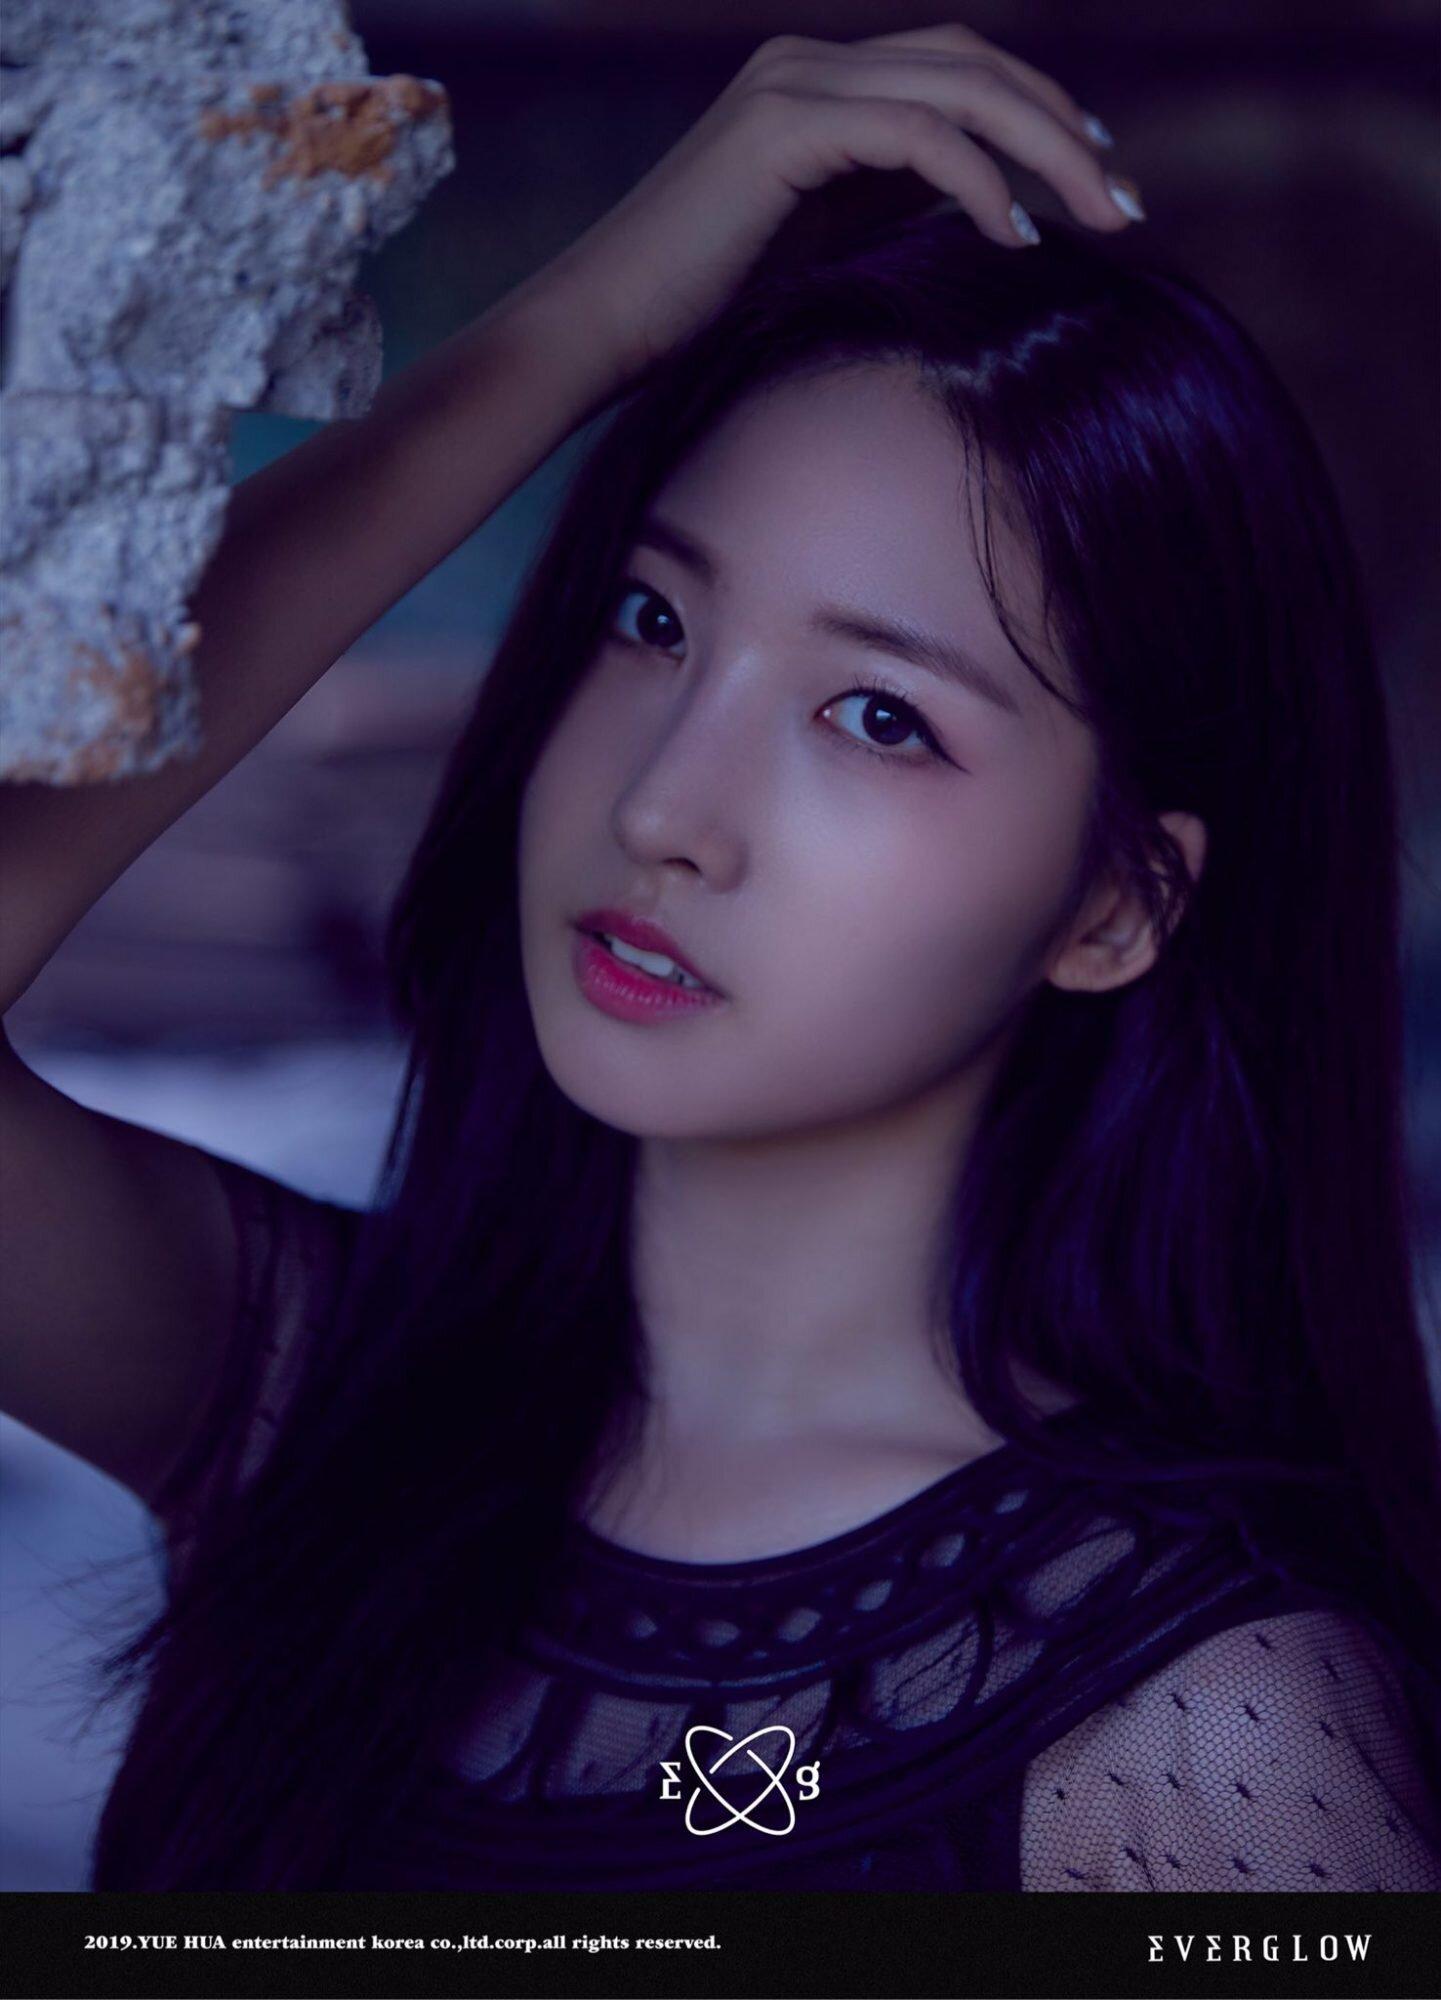 everglow_hush_teaser_sihyeon-1441x2000.jpg